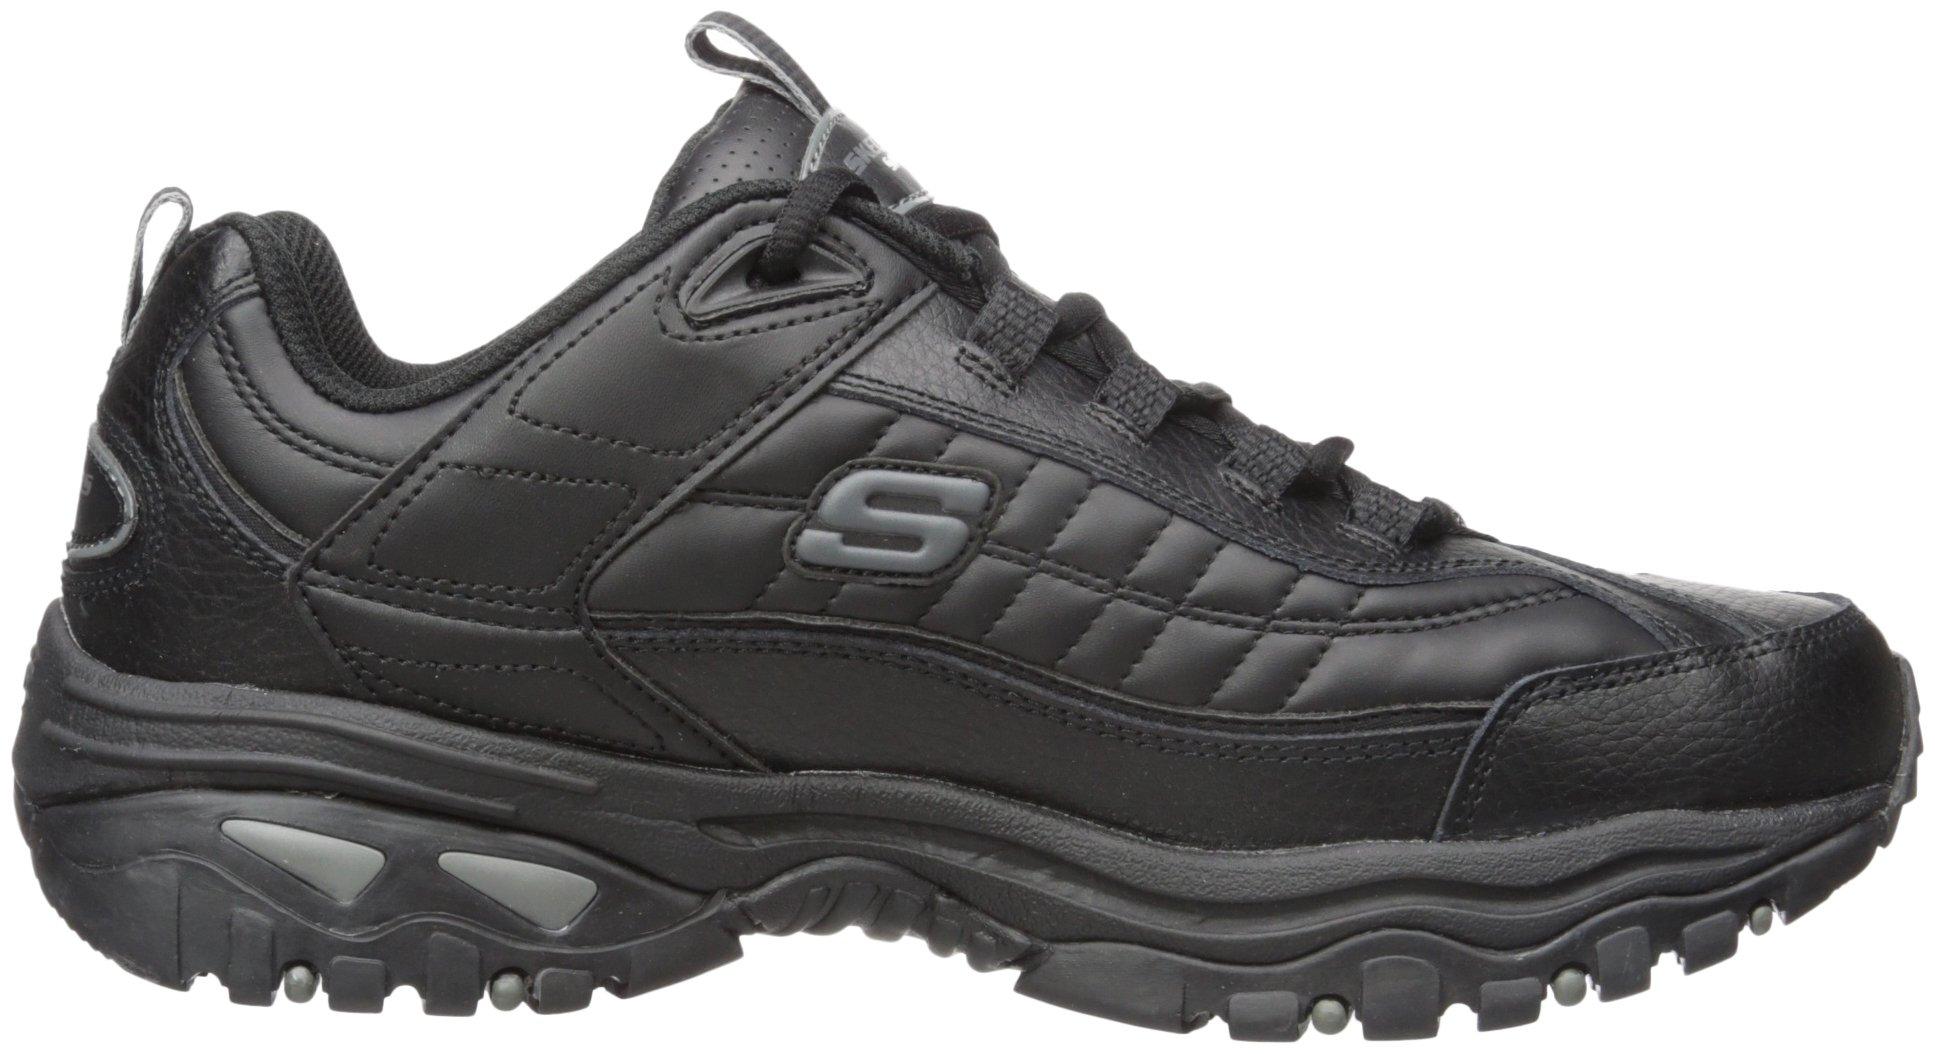 Skechers Sport Men's Energy Afterburn Lace-Up Sneaker,Black,13 M by Skechers (Image #7)